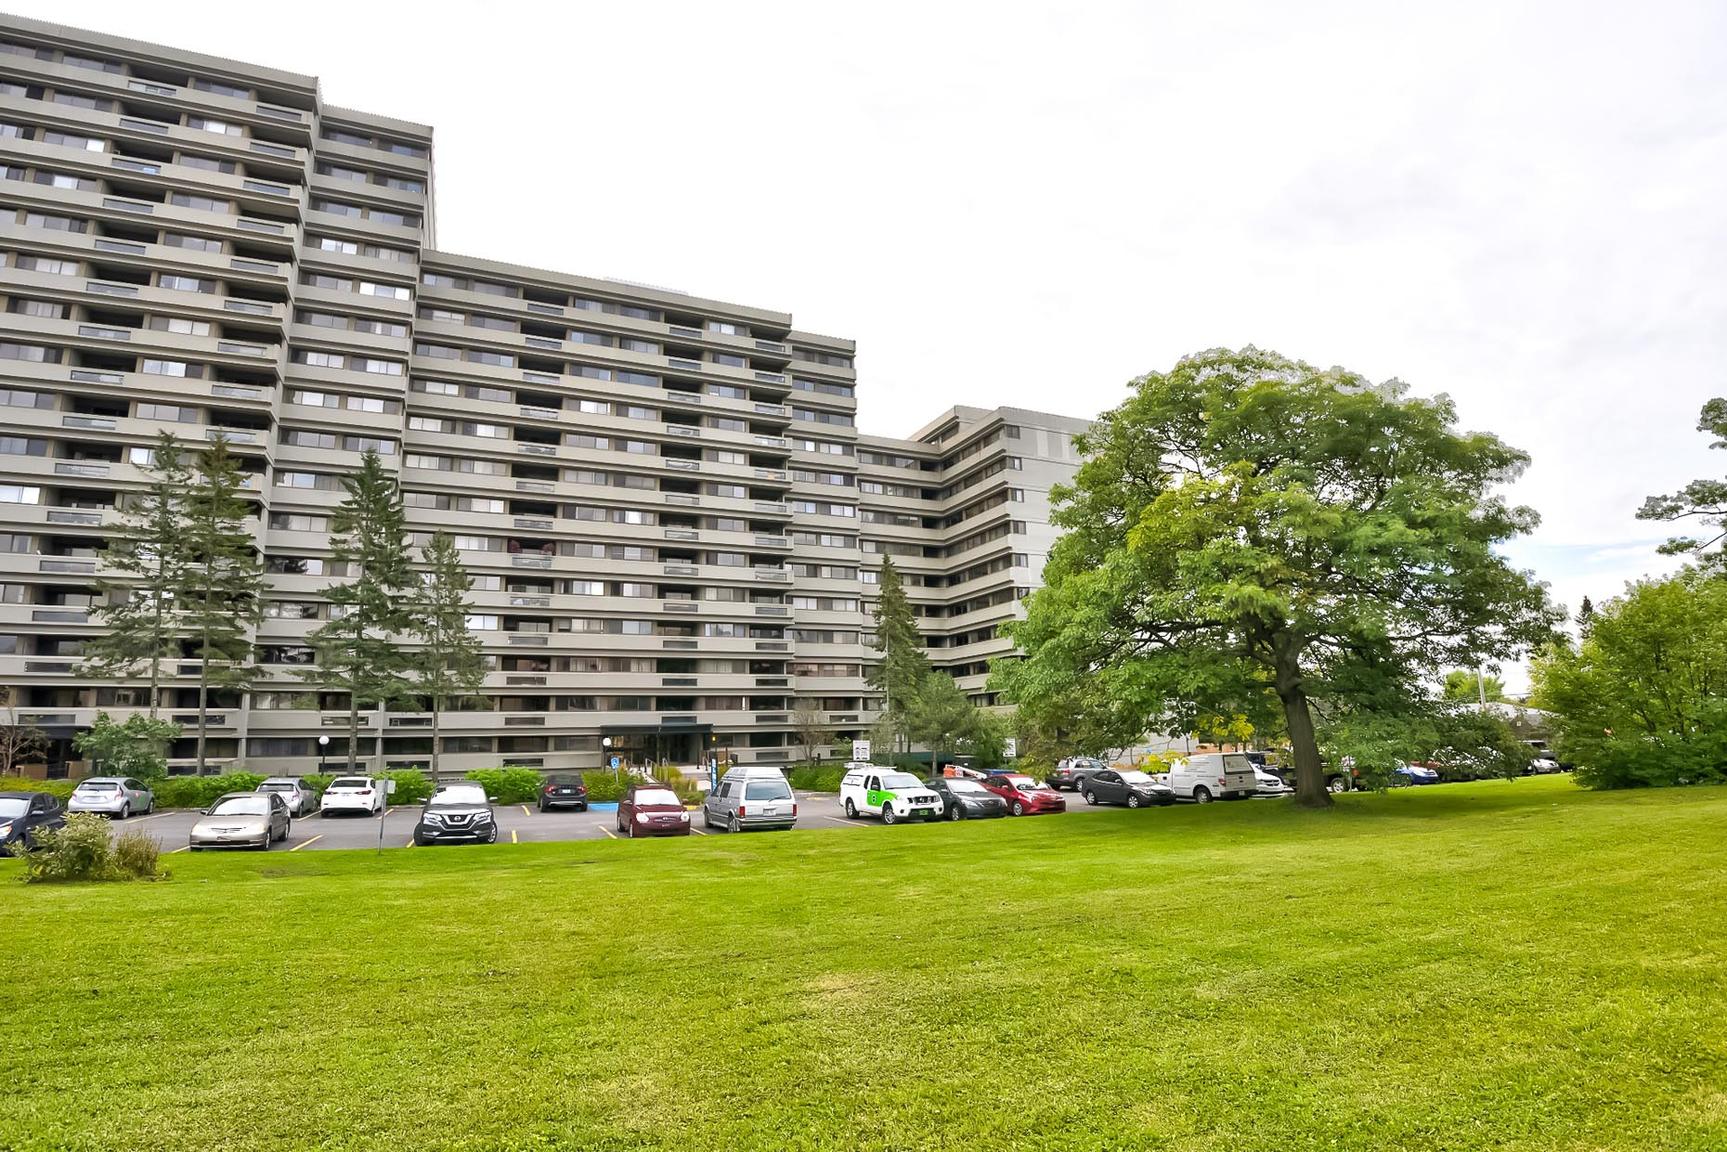 1 bedroom Apartments for rent in Quebec City at Les Jardins de Merici - Photo 34 - RentersPages – L407121